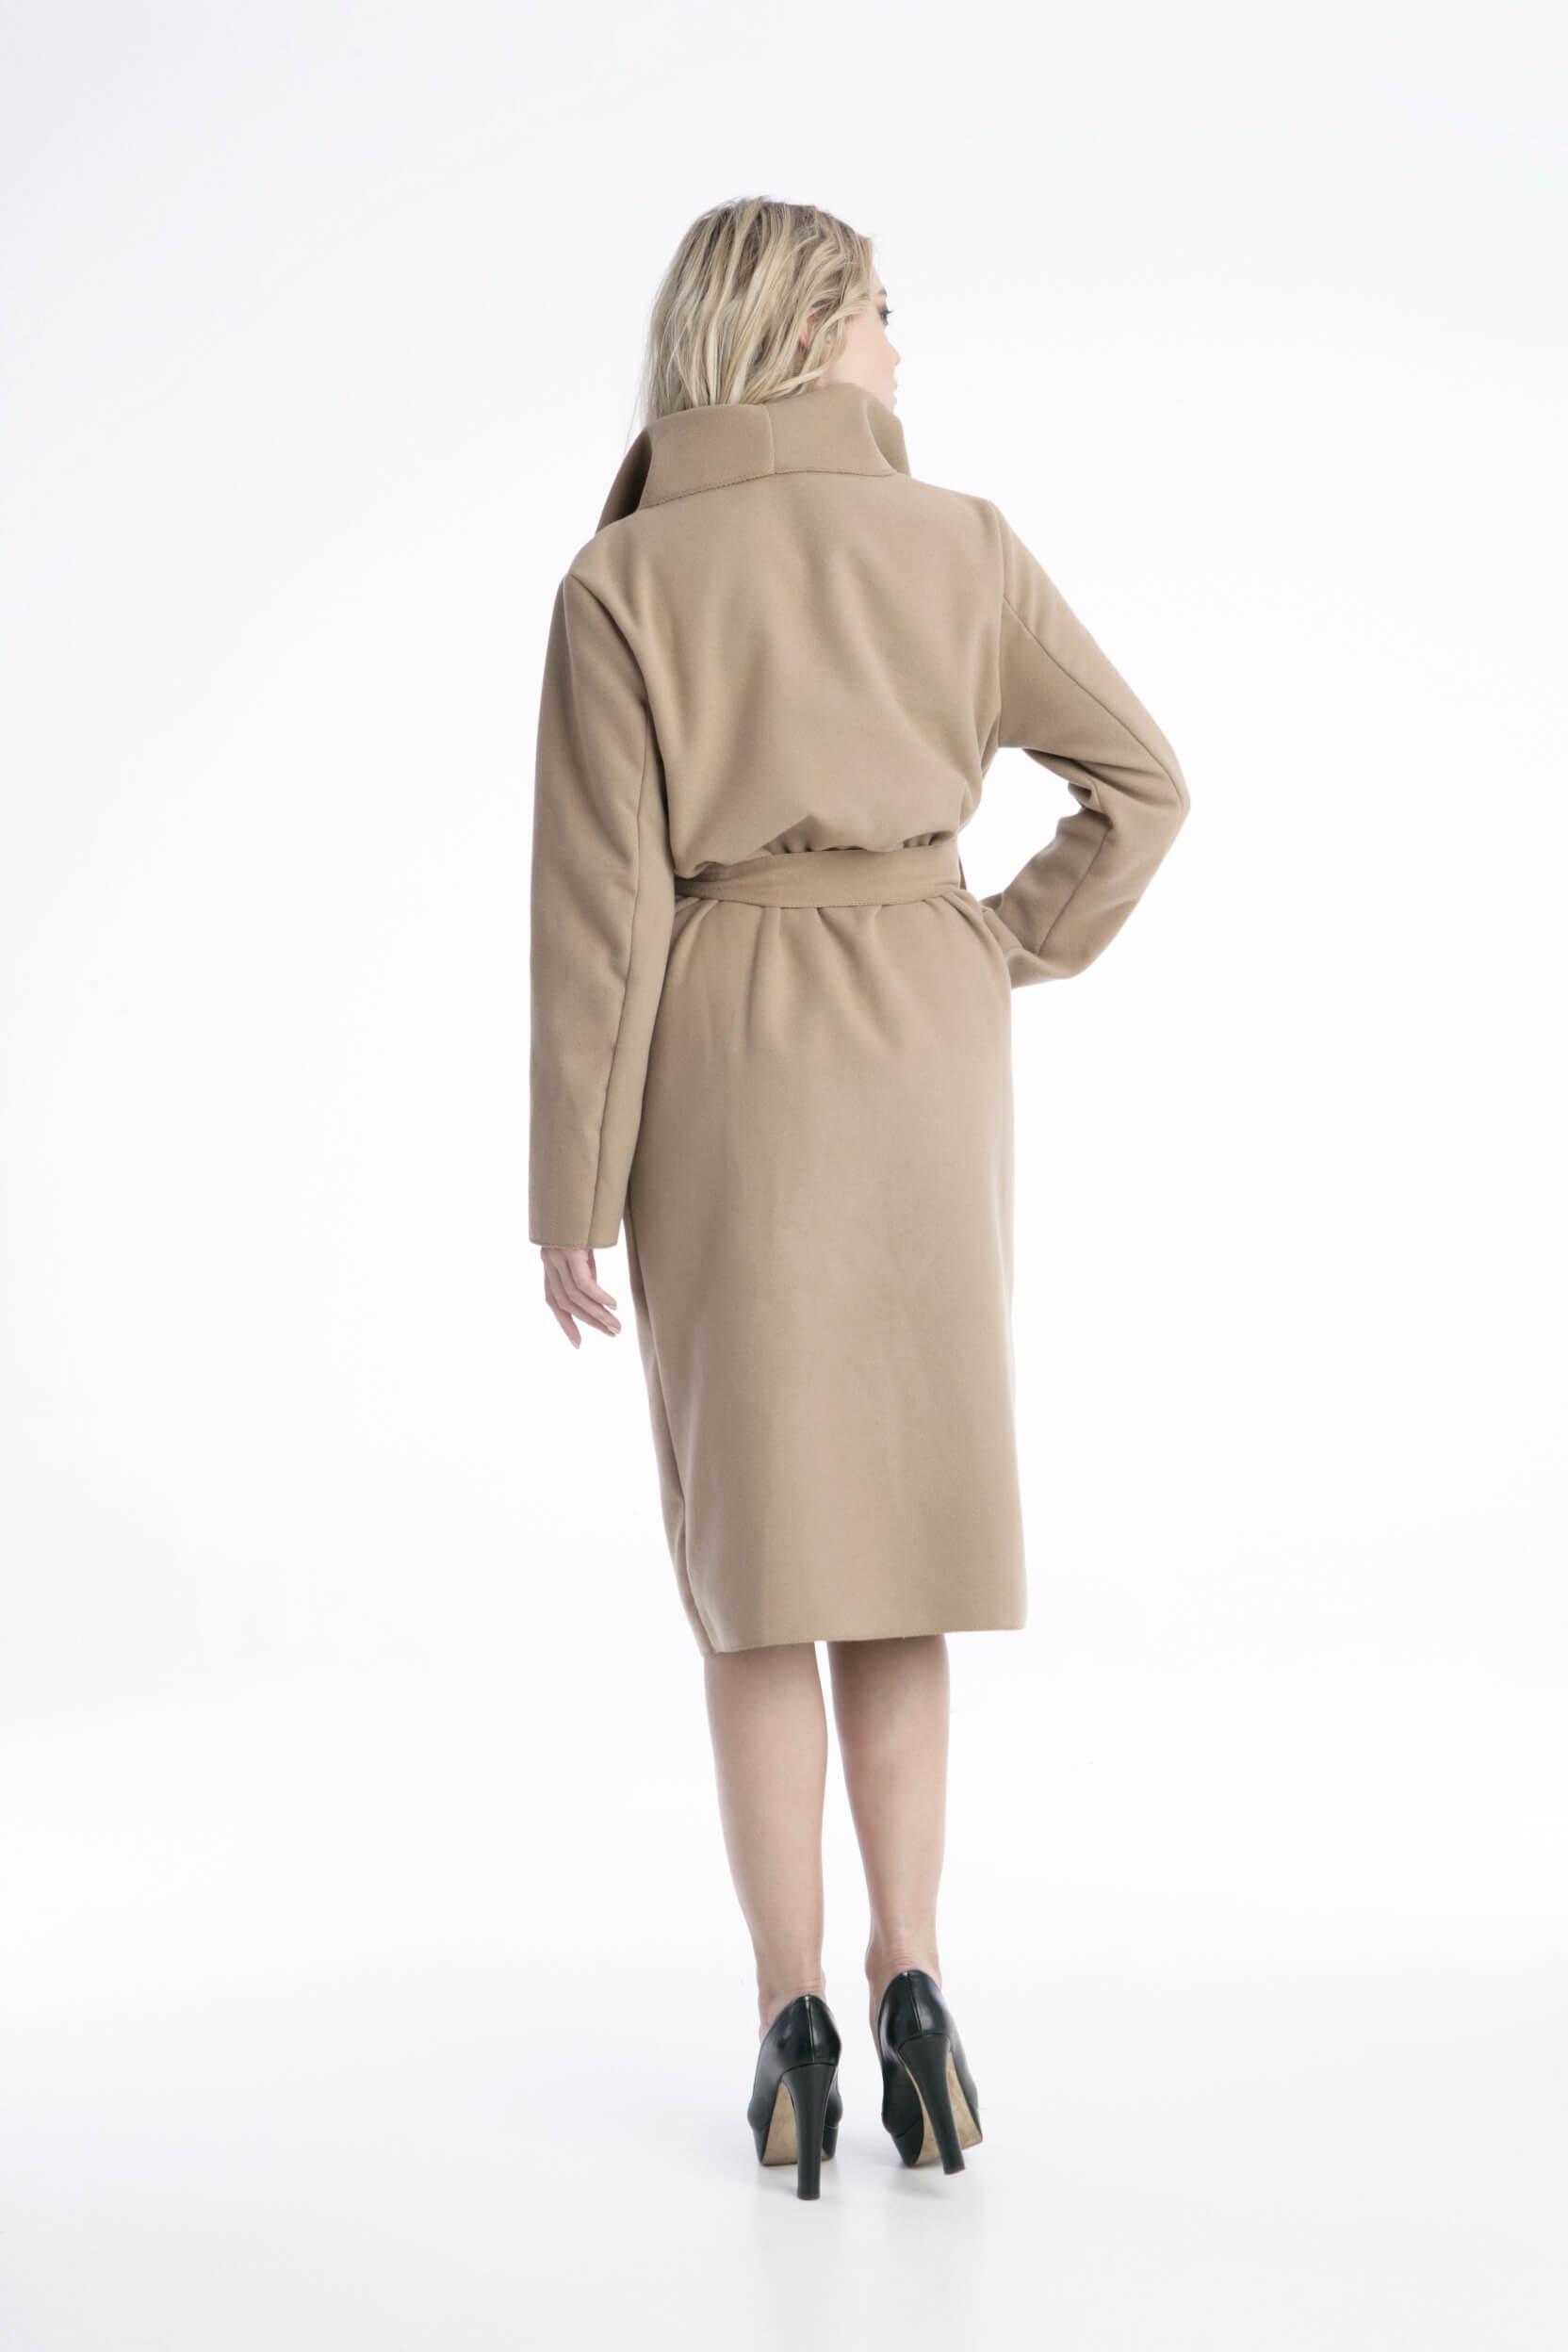 1e341bad43a7 Γυναικείο παλτό - Prestige Fashion